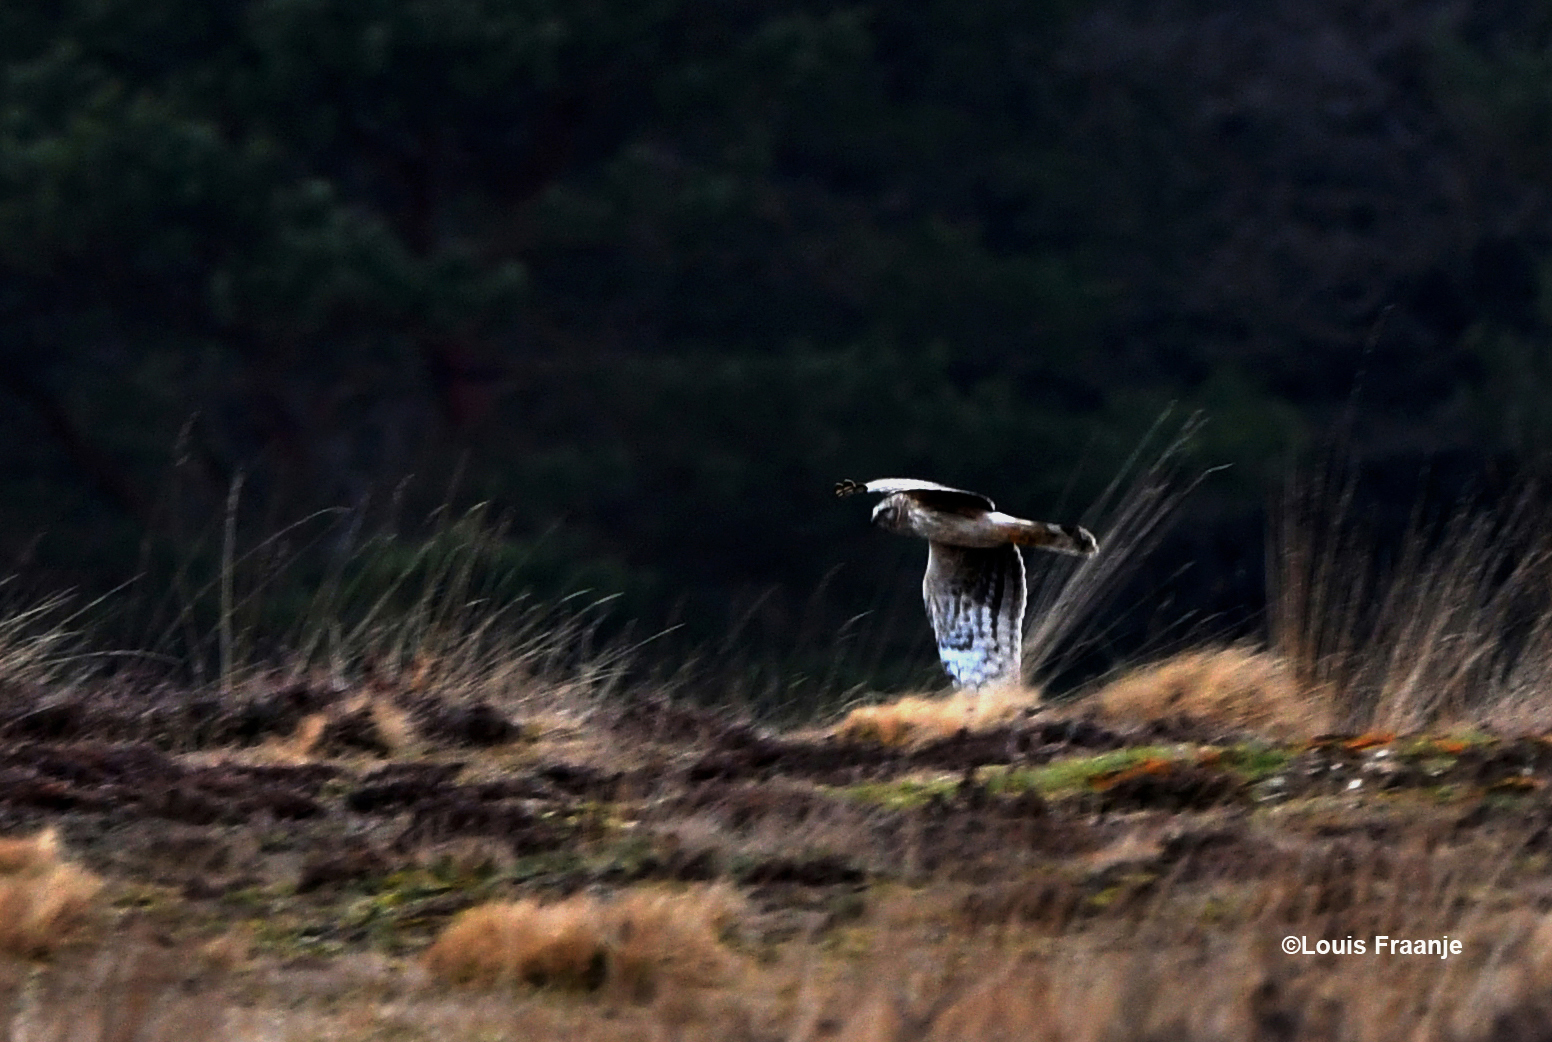 In glijvlucht kwam ze af en toe rakelings over de heide vliegen - Foto: ©Louis Fraanje